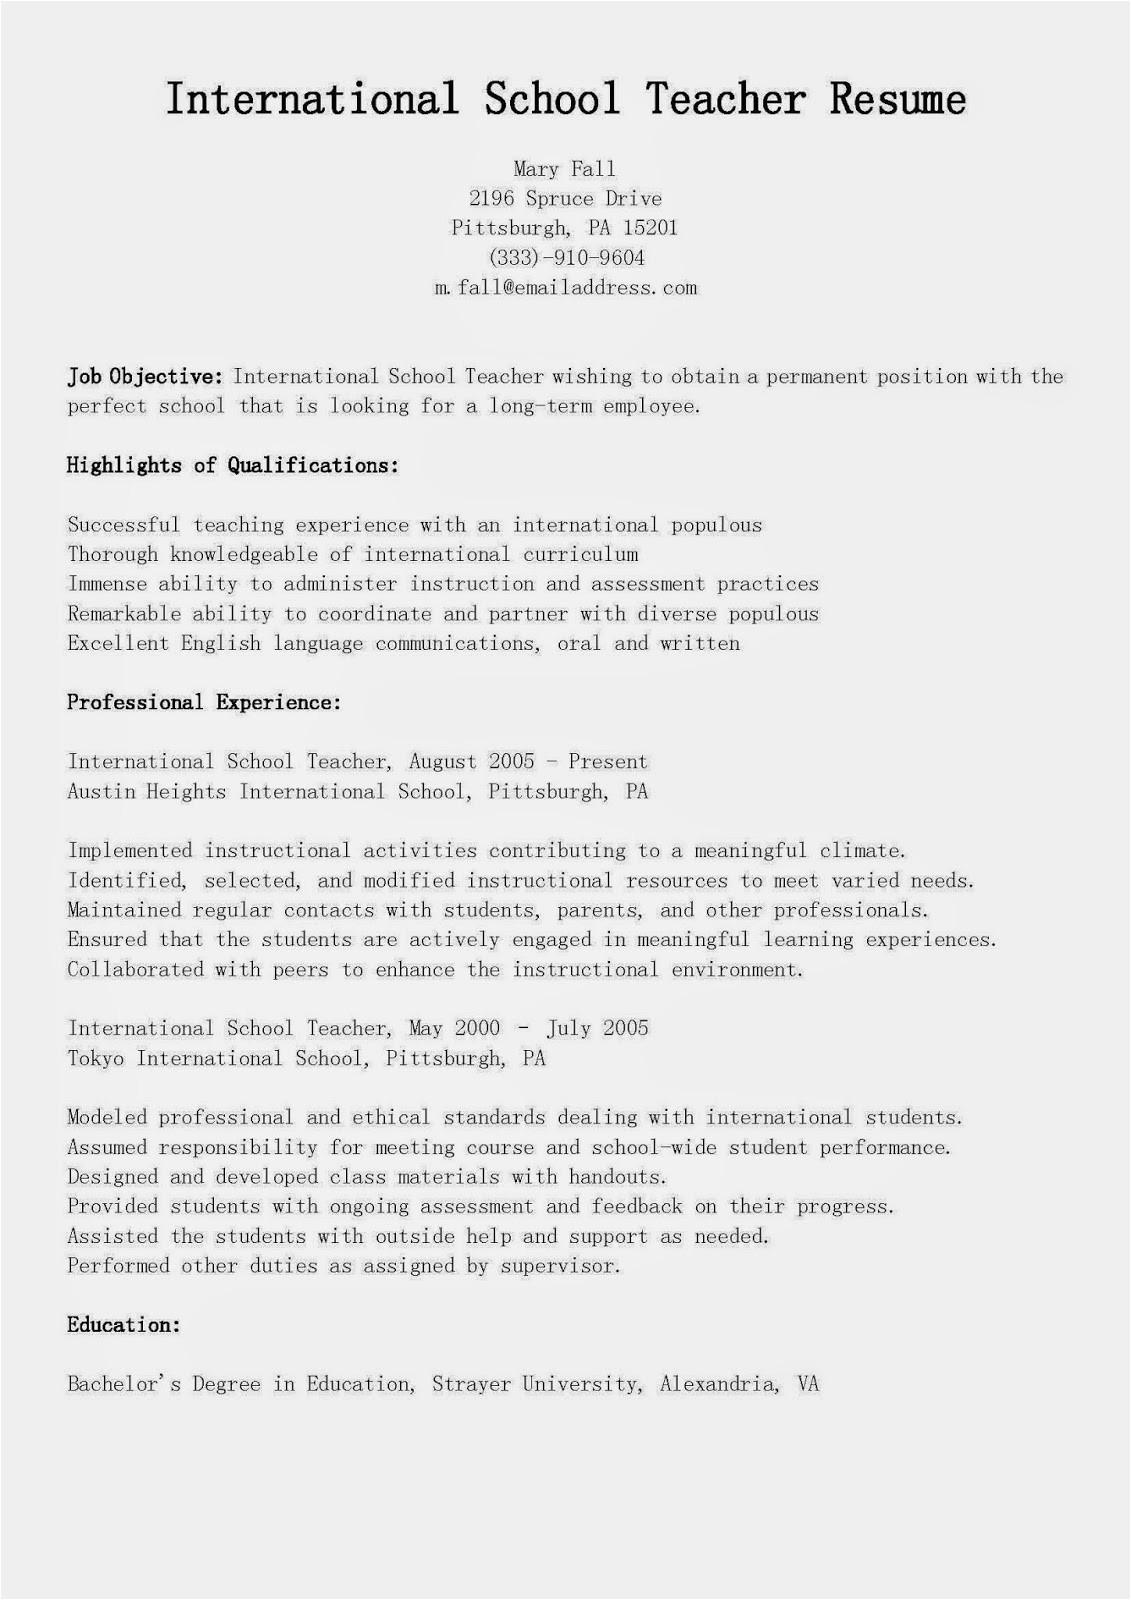 international school teacher resume